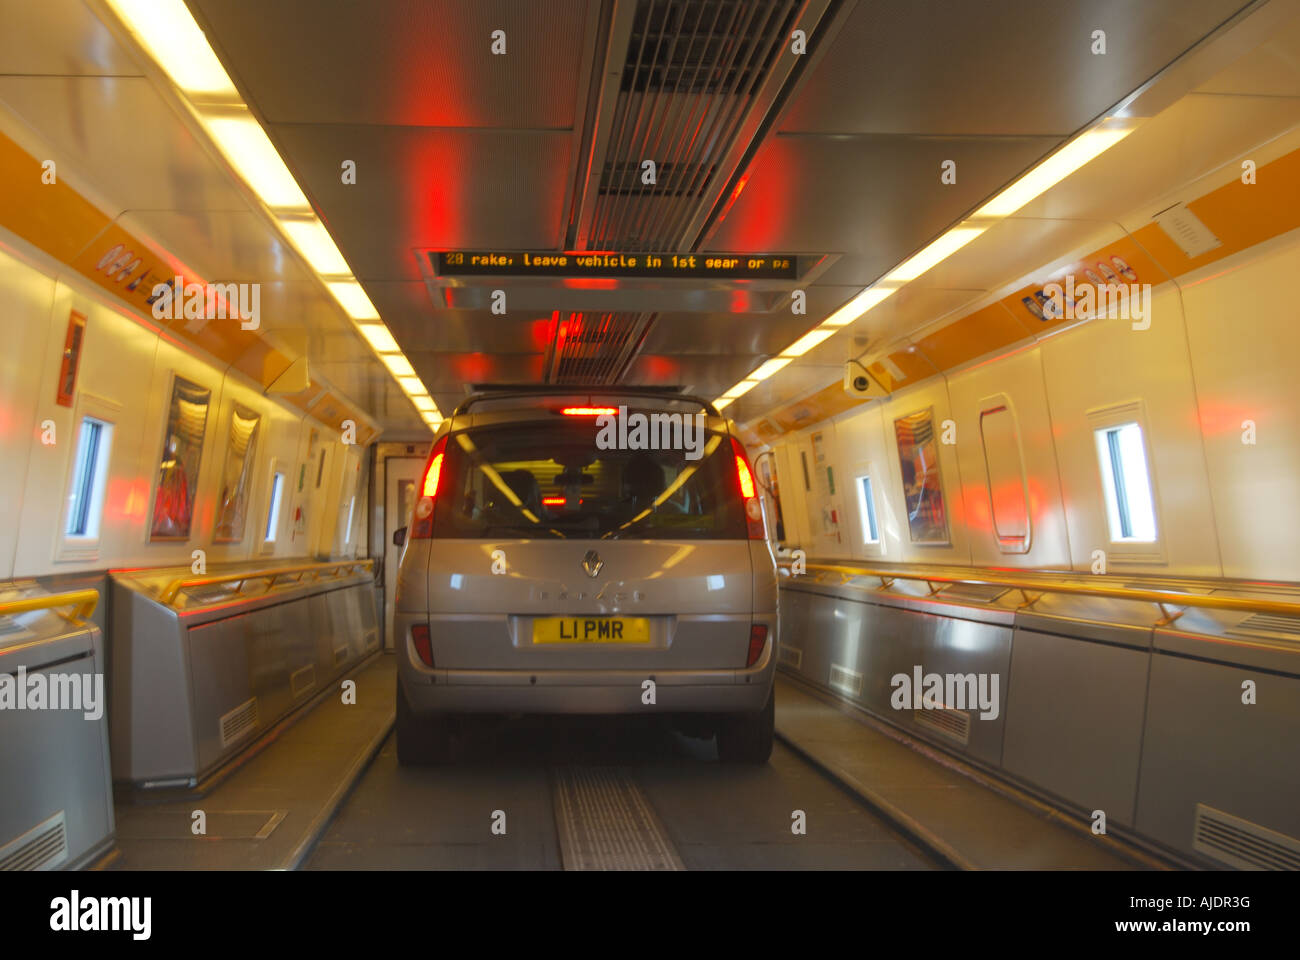 Eurostar Train Interior With Vehicle Inside Stock Photo